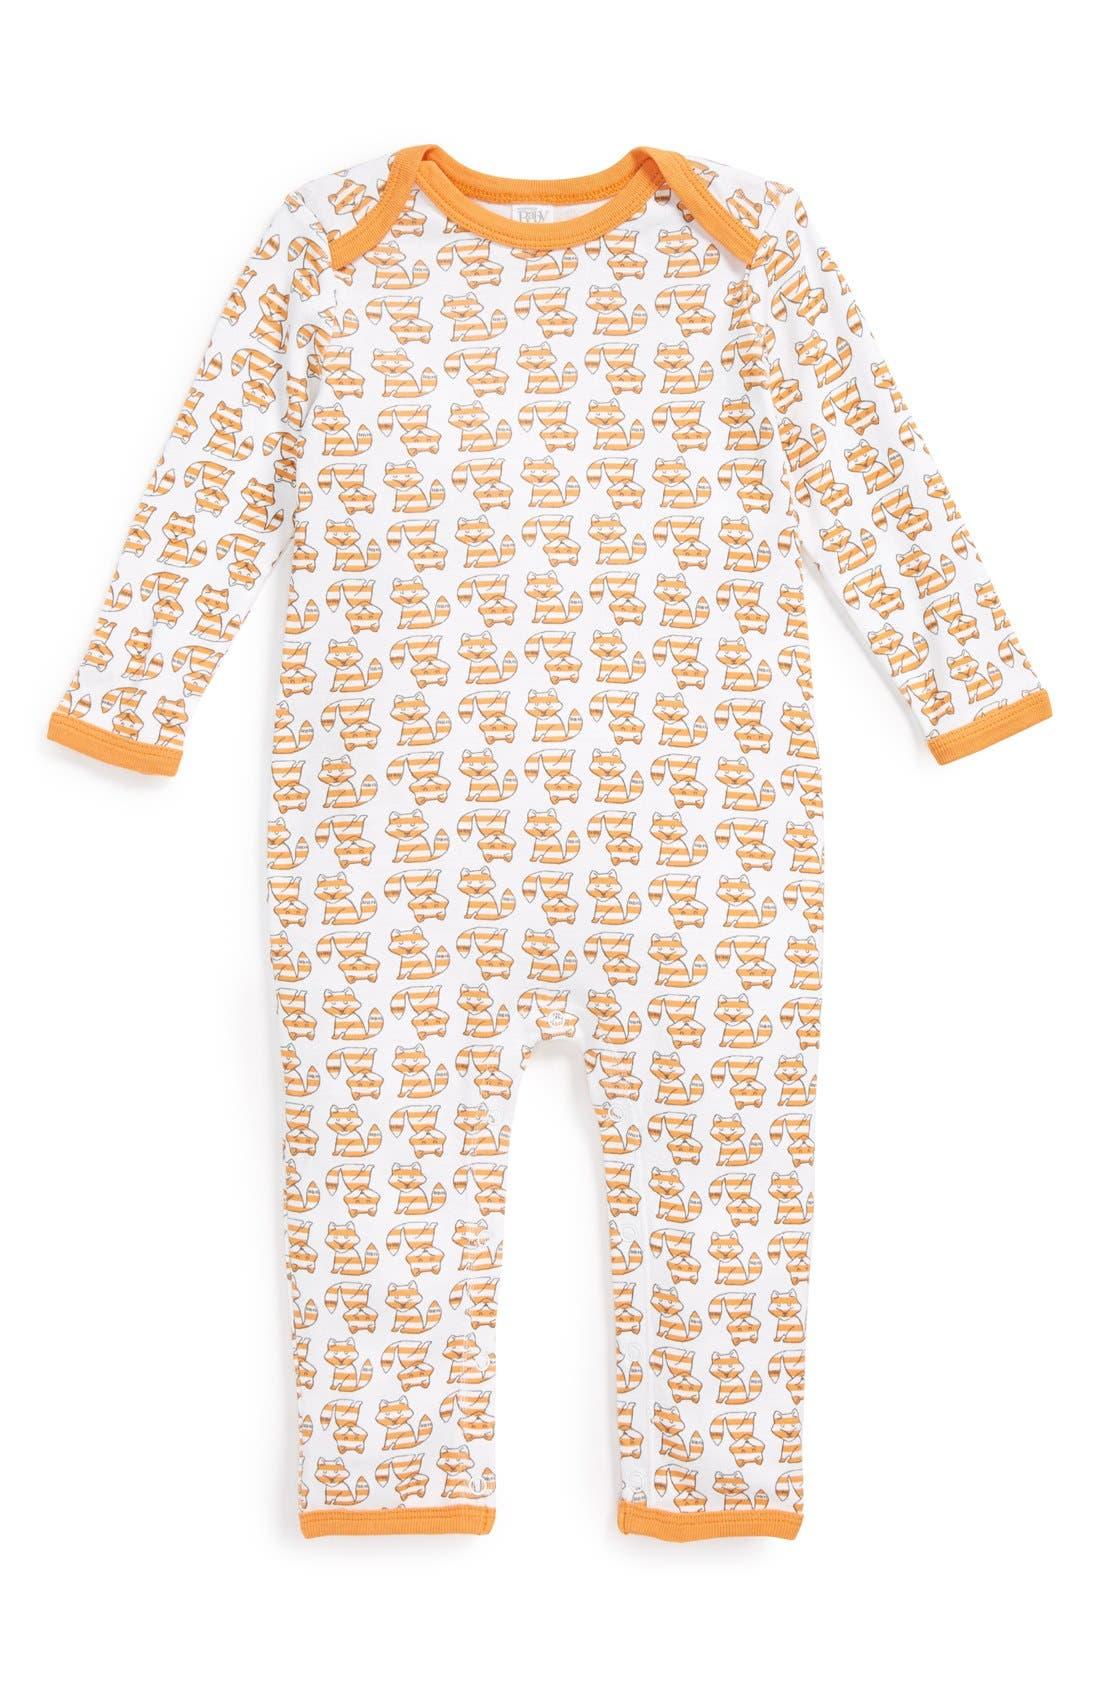 Alternate Image 1 Selected - Nordstrom Baby Print Romper (Baby Boys)